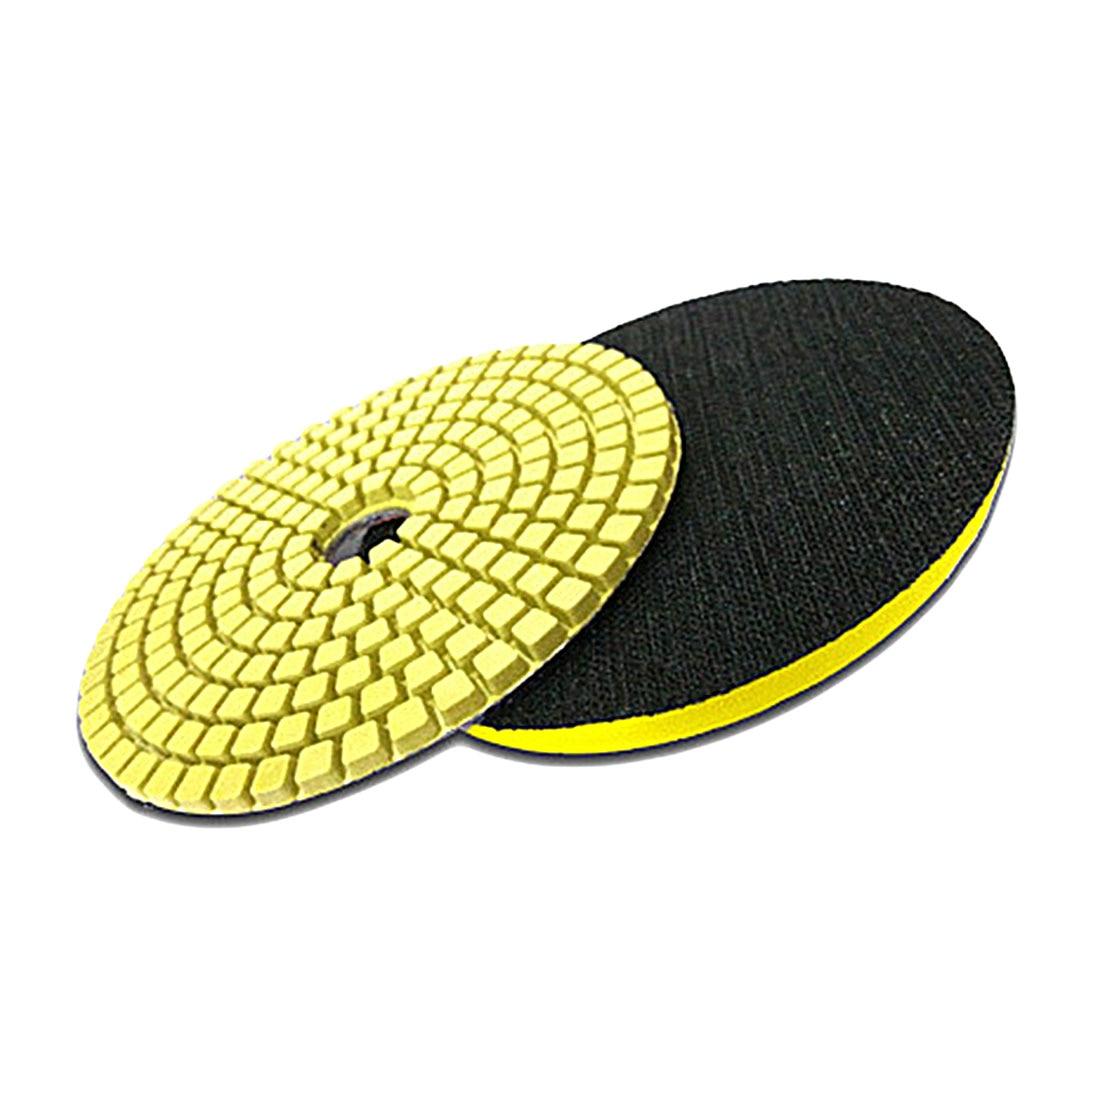 4 100mm Diamond Wet Grinding Disc Flexible Polishing Pad for Marble Stone Ceramic Tiles настенная плитка love ceramic tiles essentia square white ret 35x100